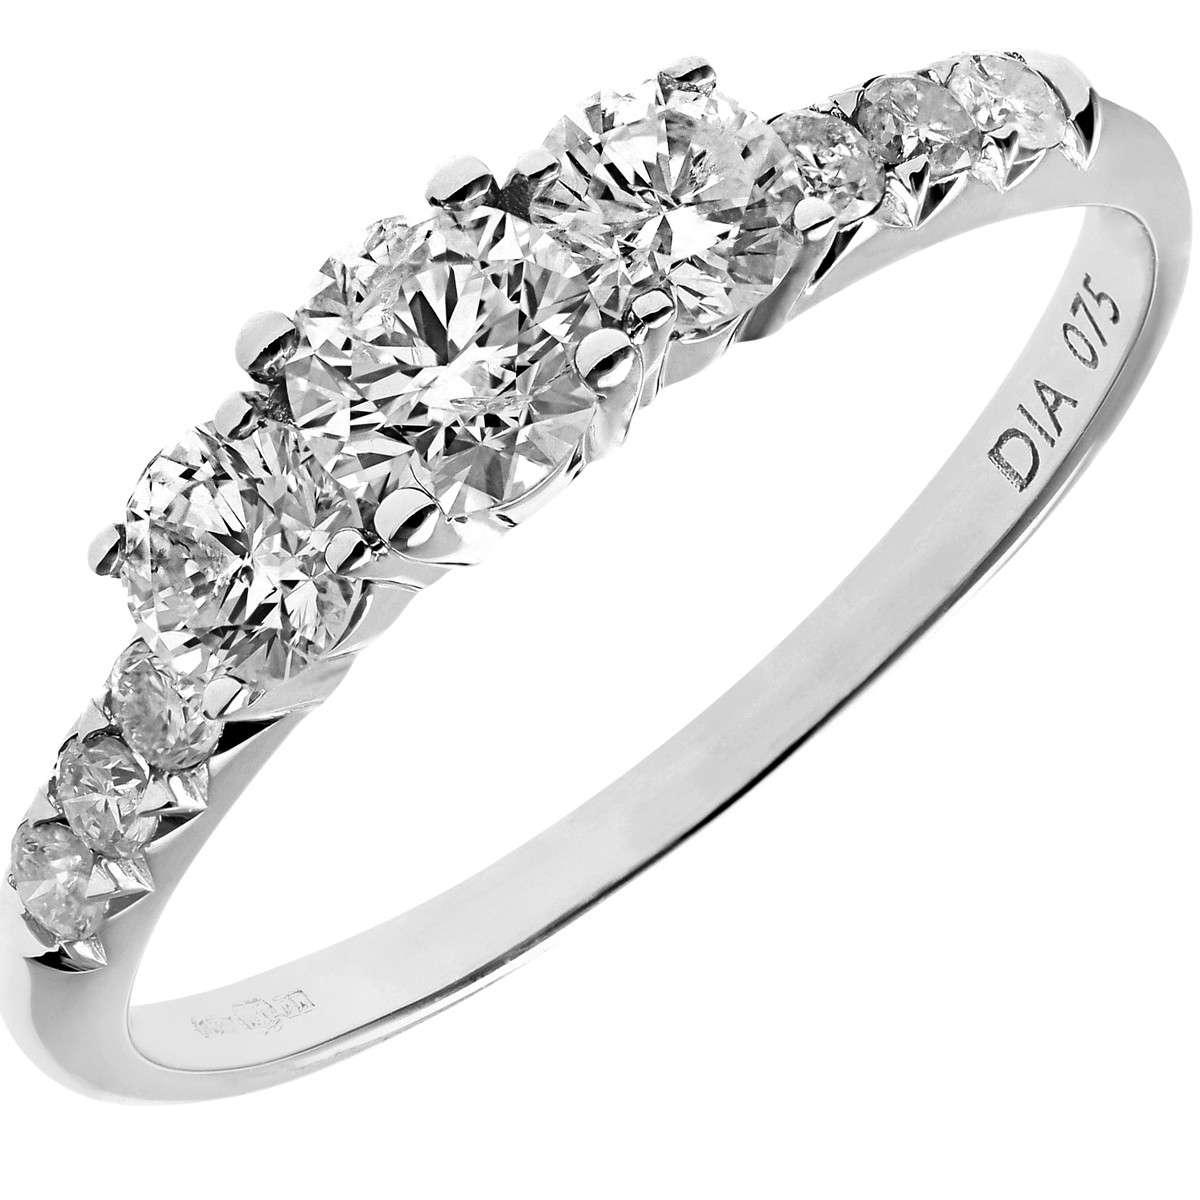 18CT WHITE GOLD 0.75CT DIAMOND ENGAGEMENT SHOULDER RING